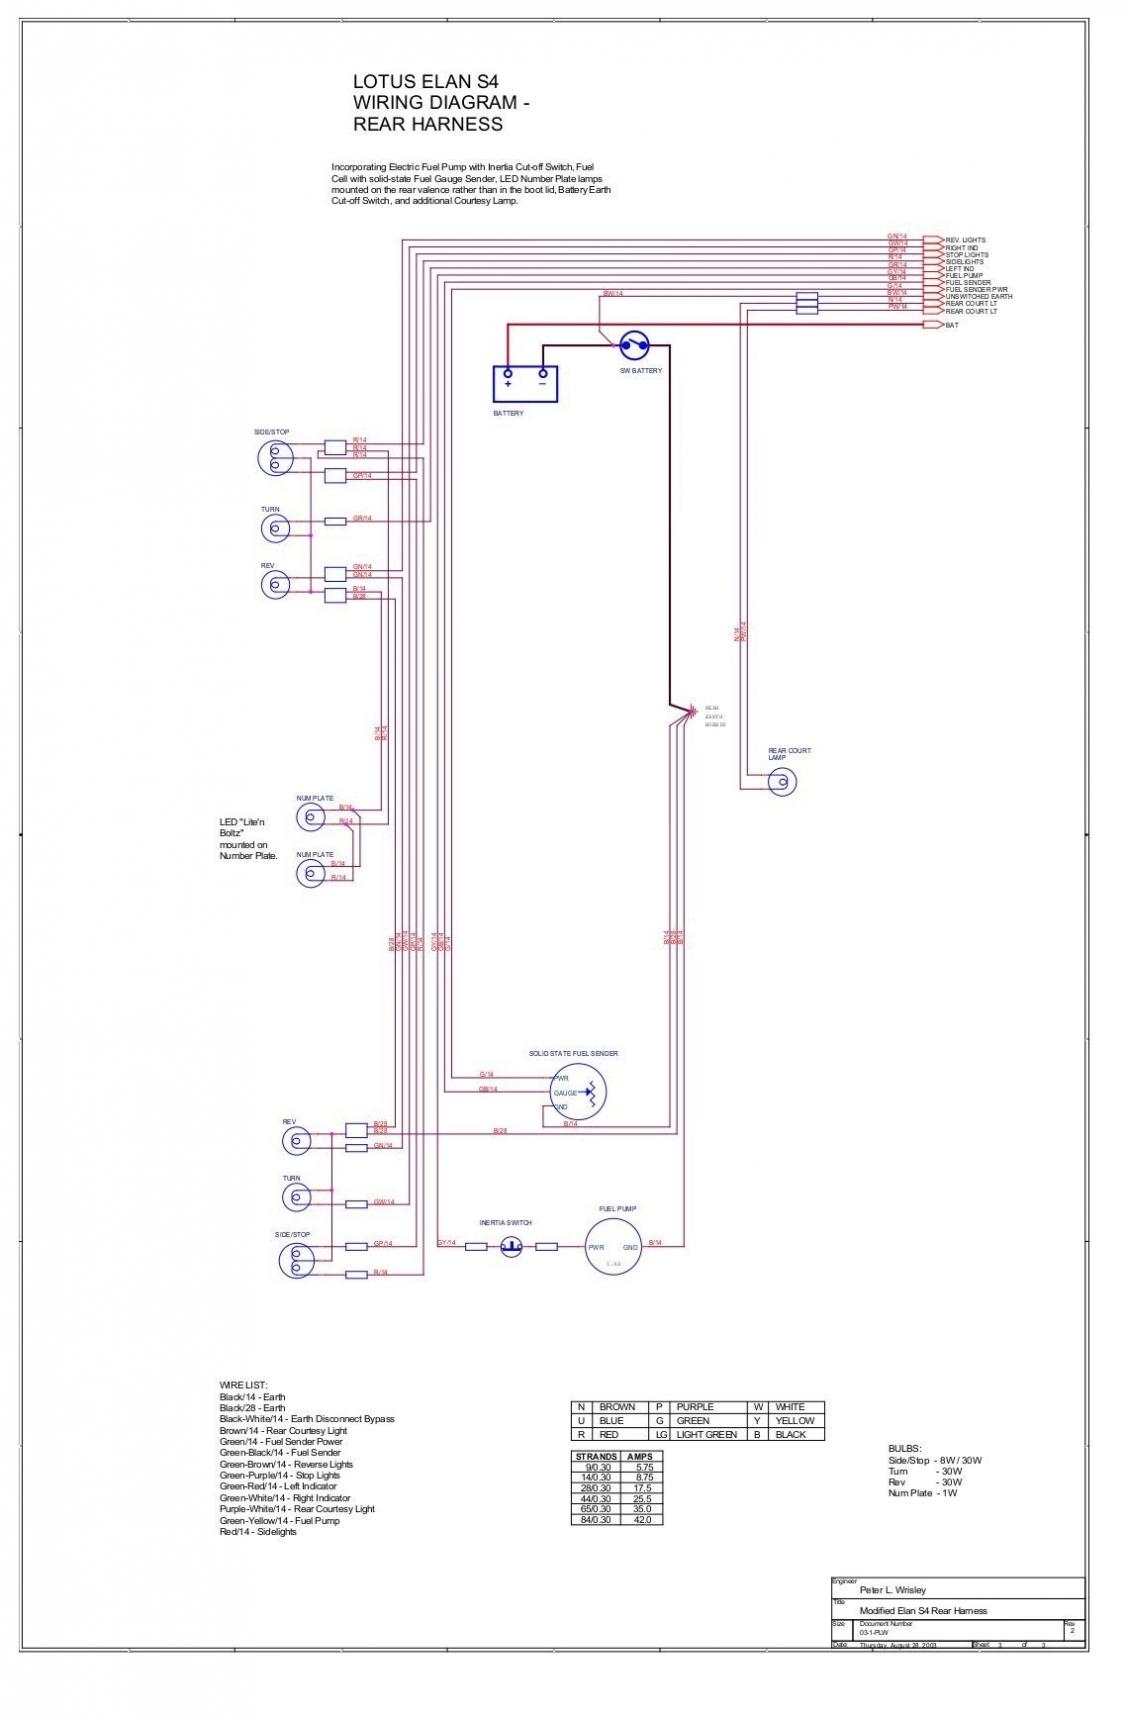 Golf Cart Led Wiring Diagram | Wiring Library - Golf Cart Battery Meter Wiring Diagram